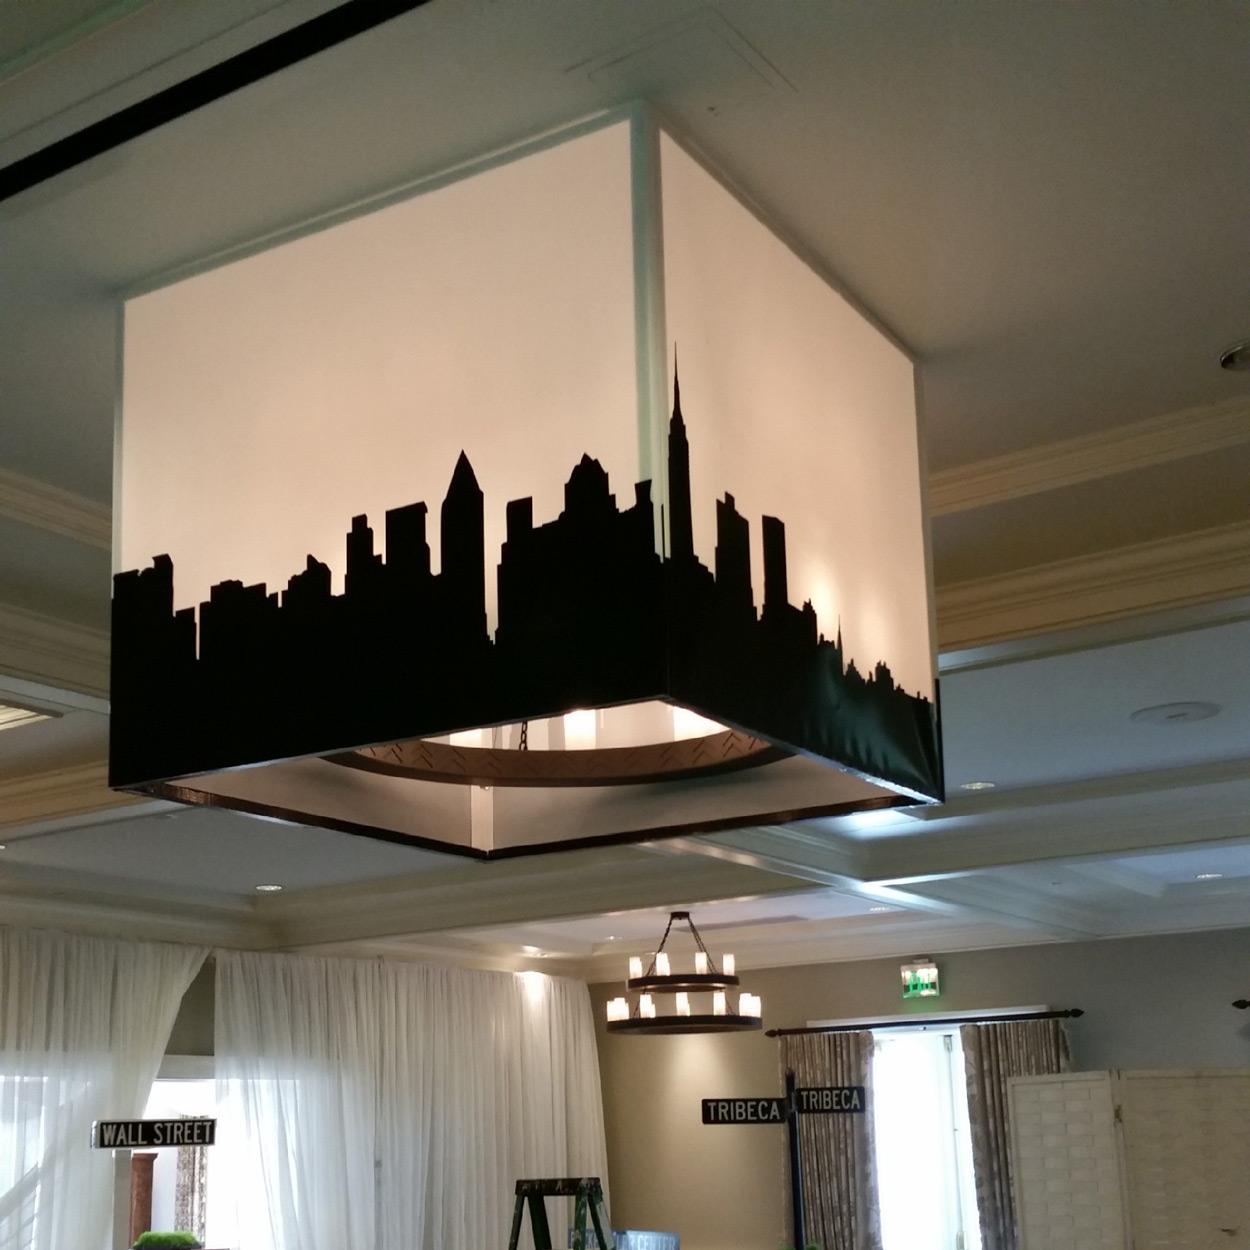 Tradeshow_lamp_sign.jpg